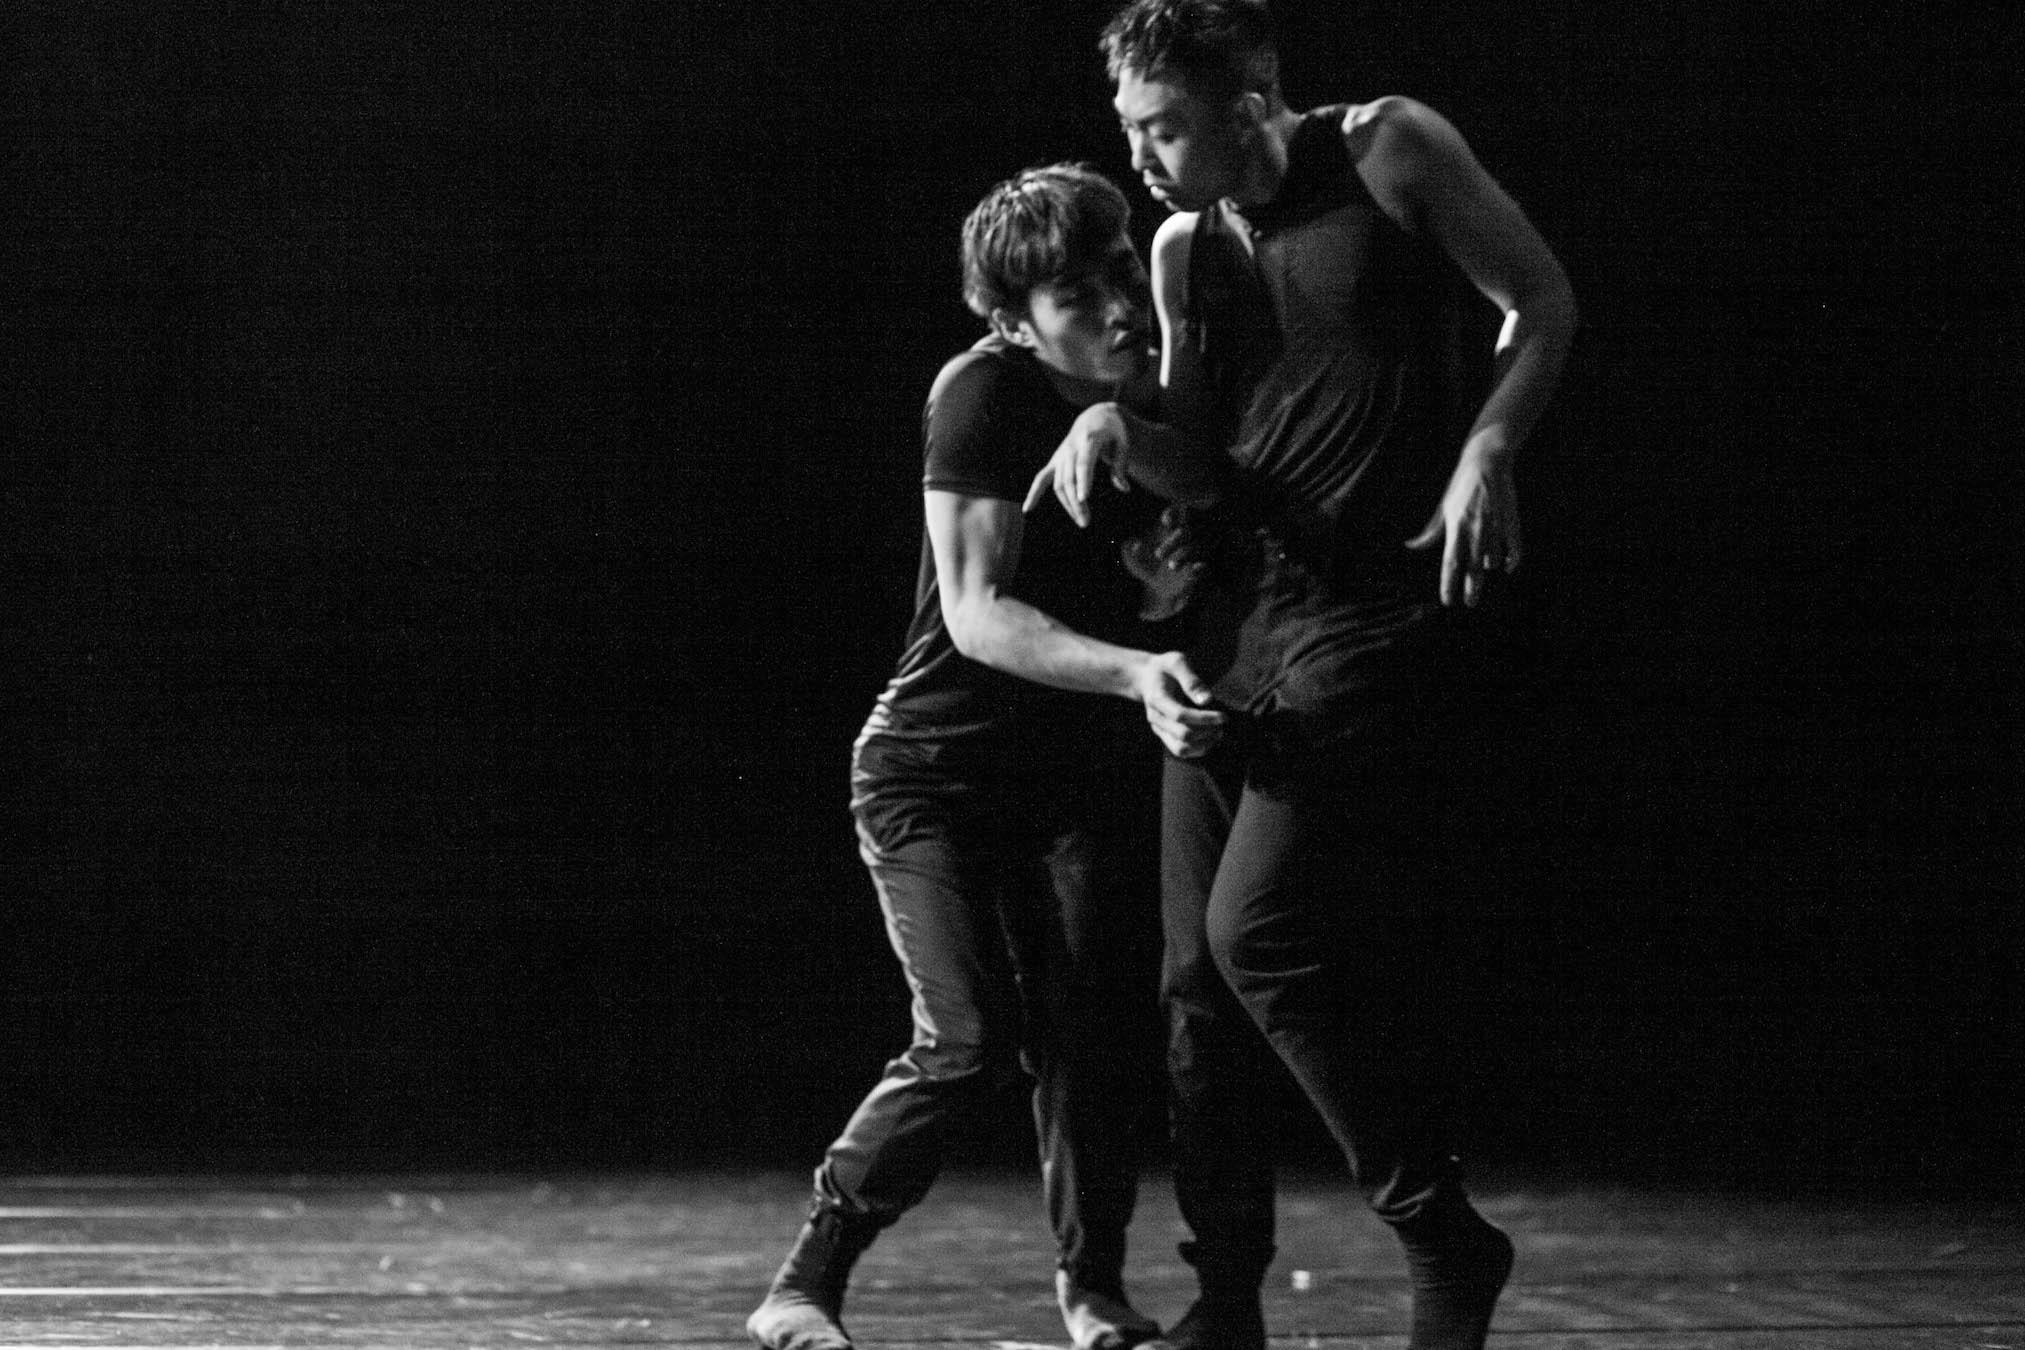 http://www.danzaurbana.eu/associazione/wp-content/uploads/2018/05/Masdanza_Hugin_Munin_2016.jpg